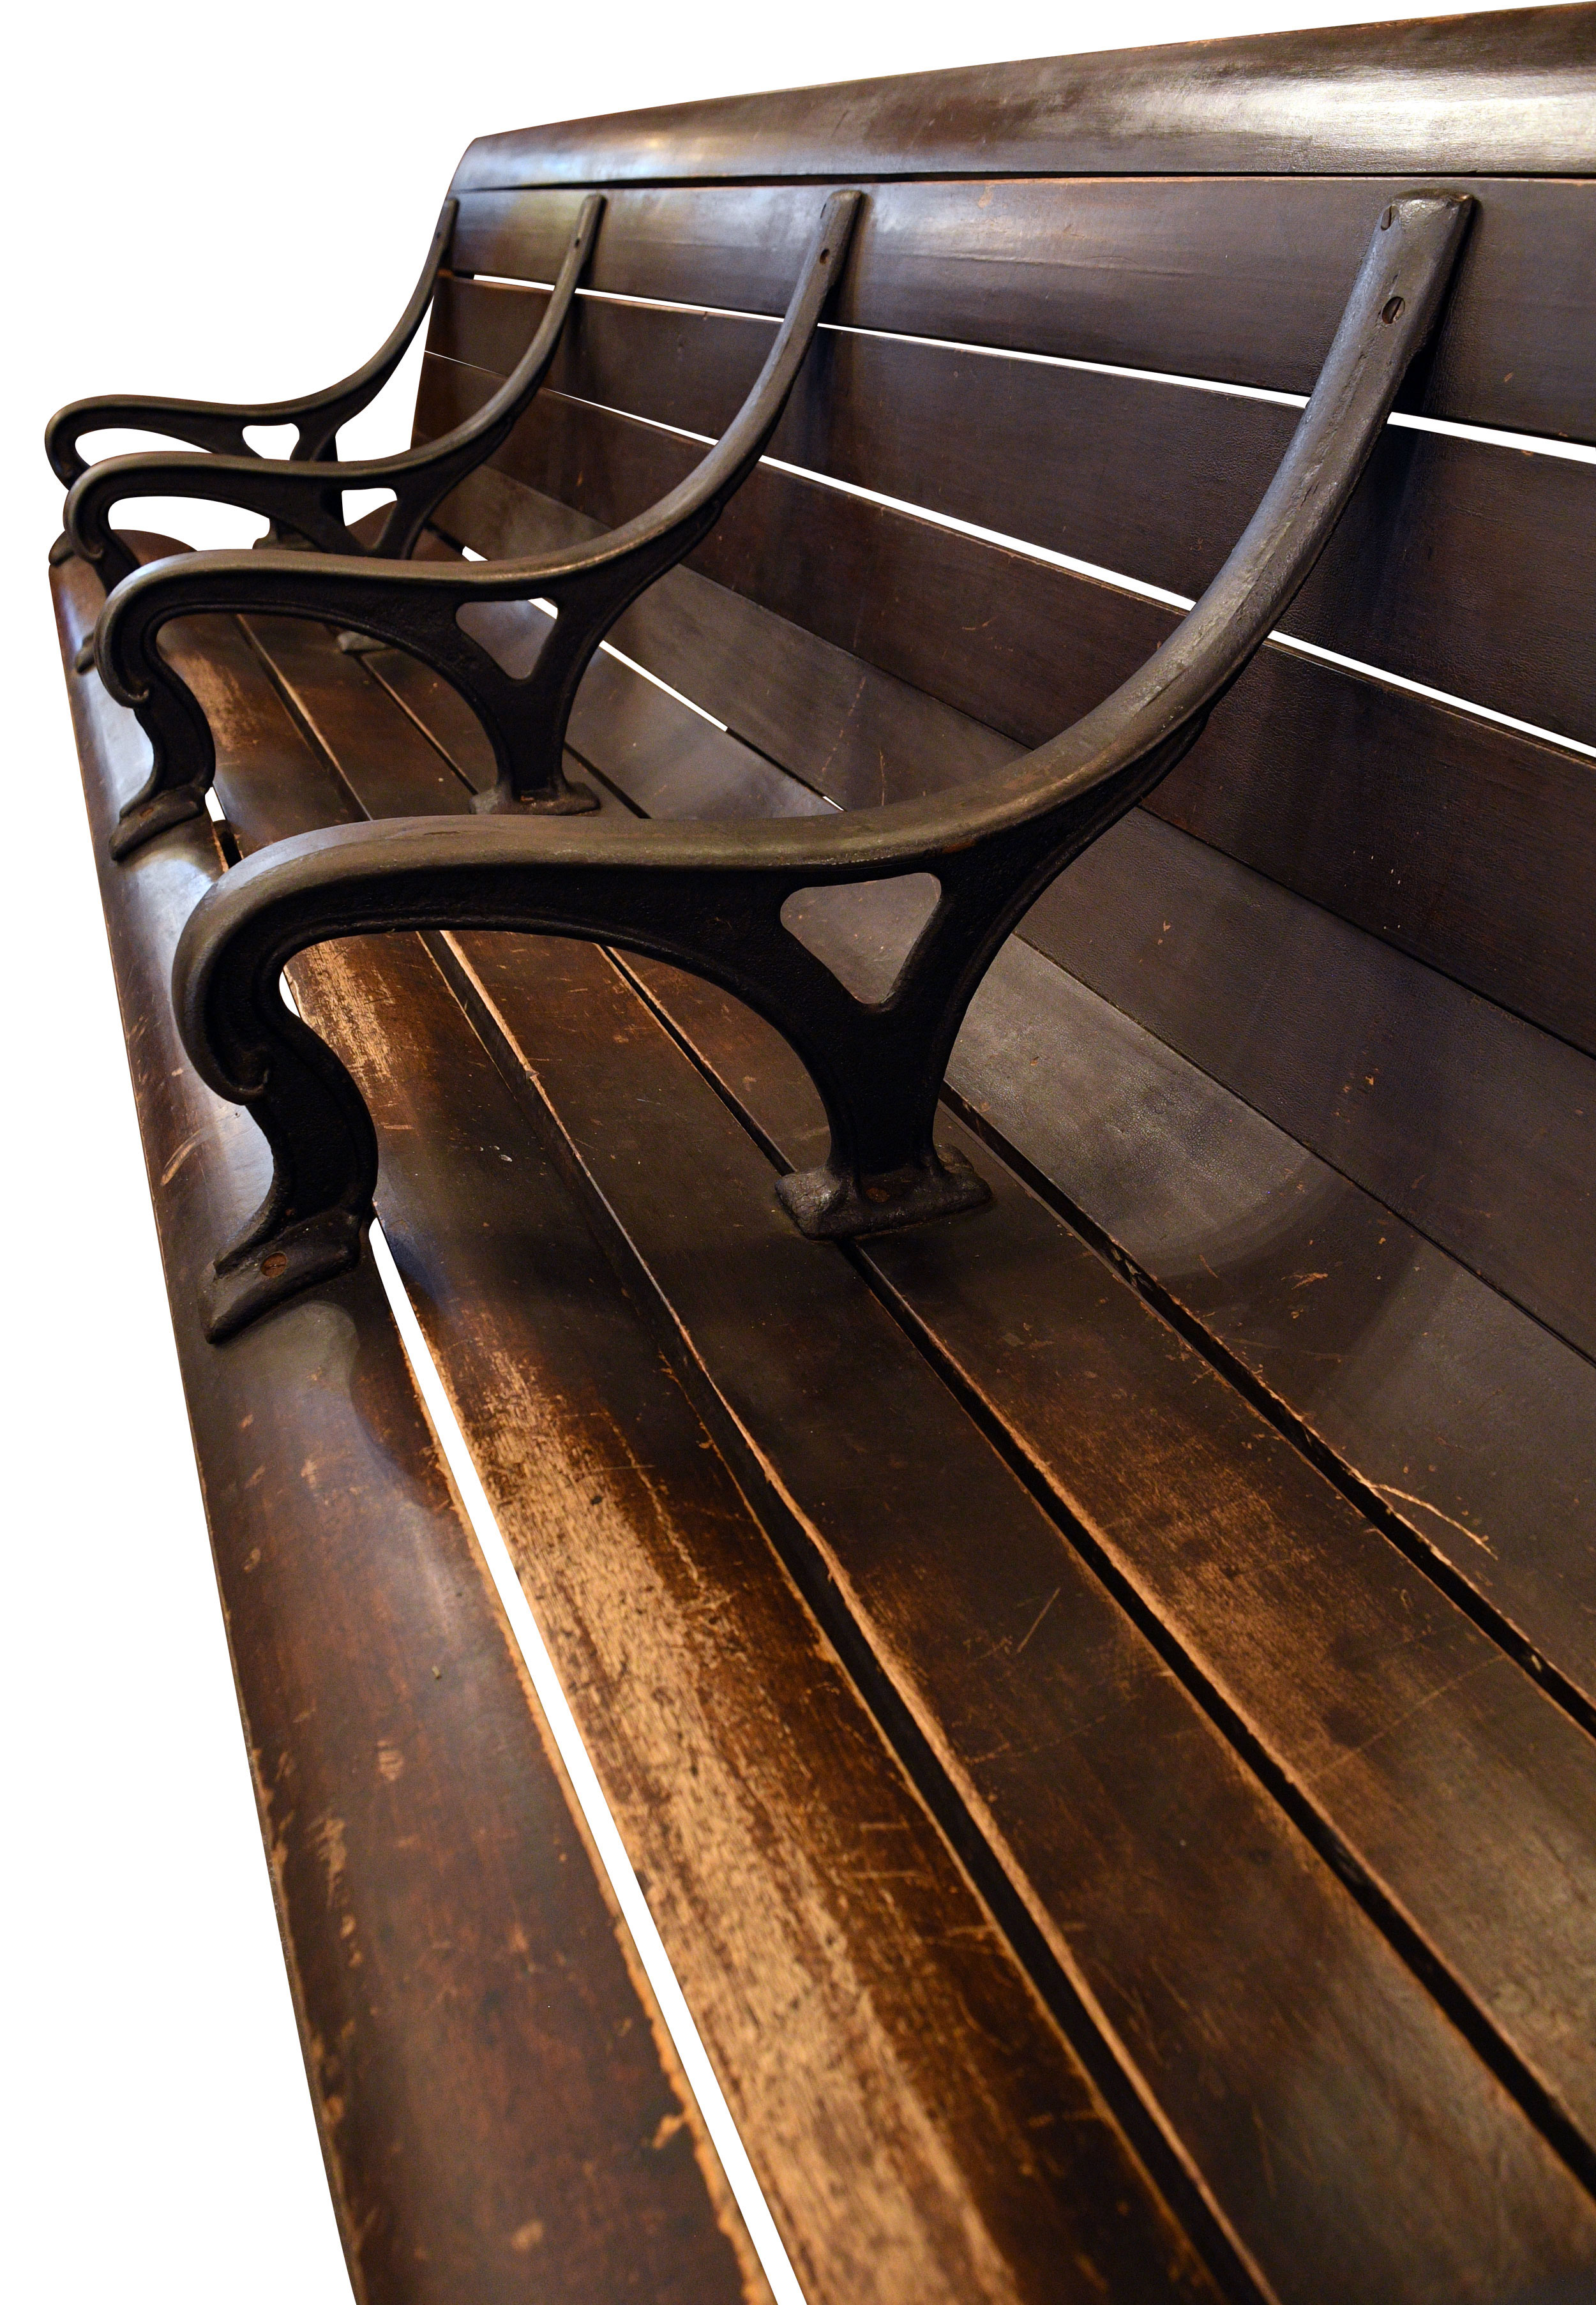 48005-divided-wood-and-iron-bench-closeup.jpg